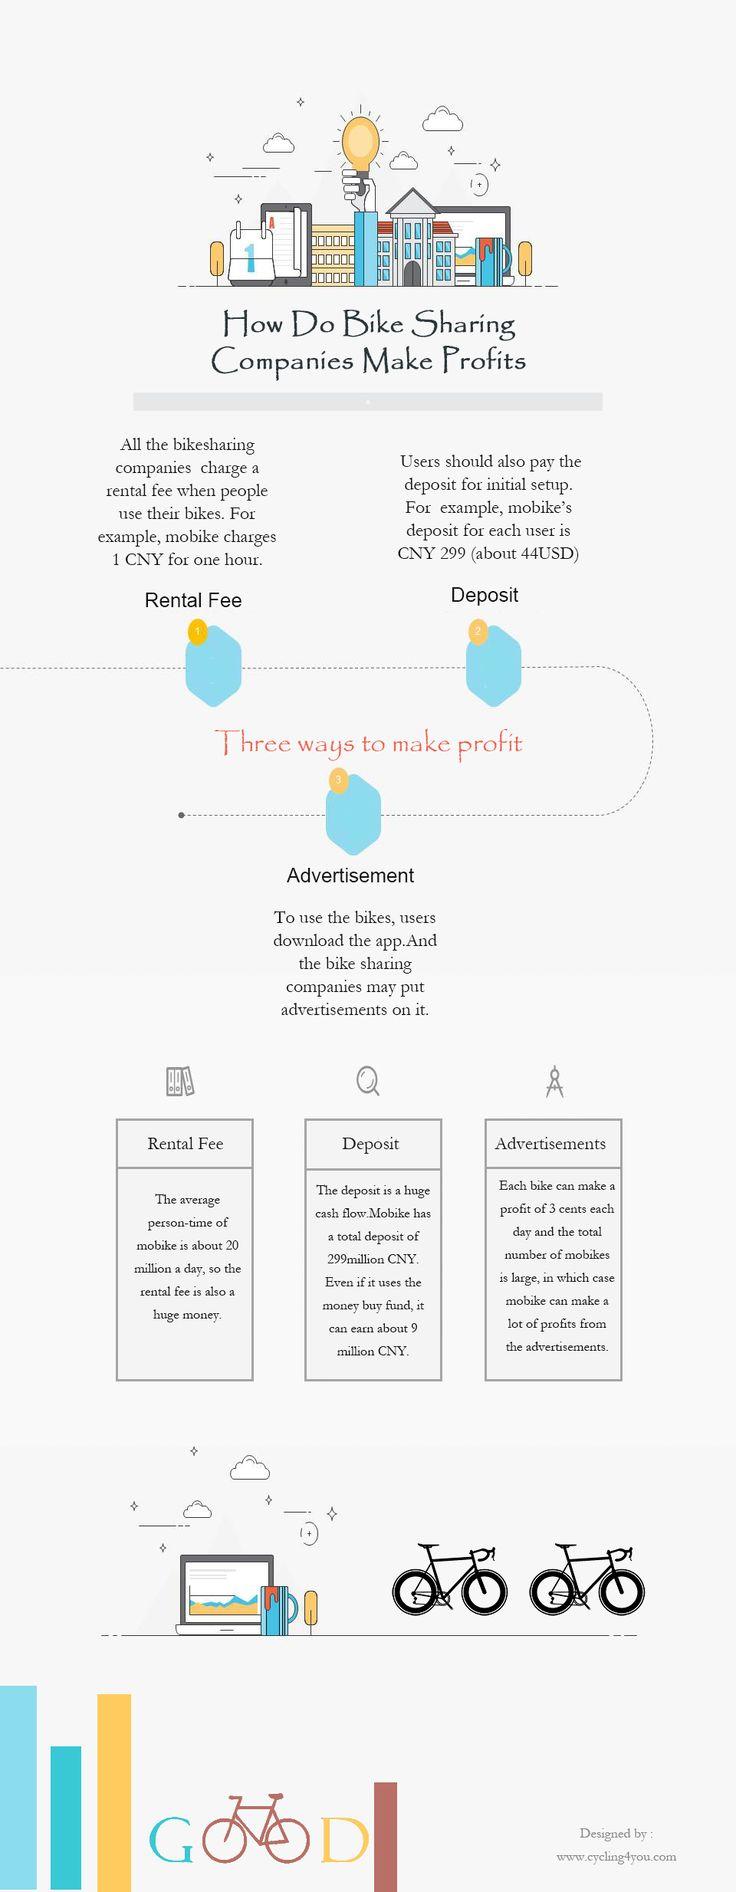 How Do Bike Sharing Companies Make Profits [infographic